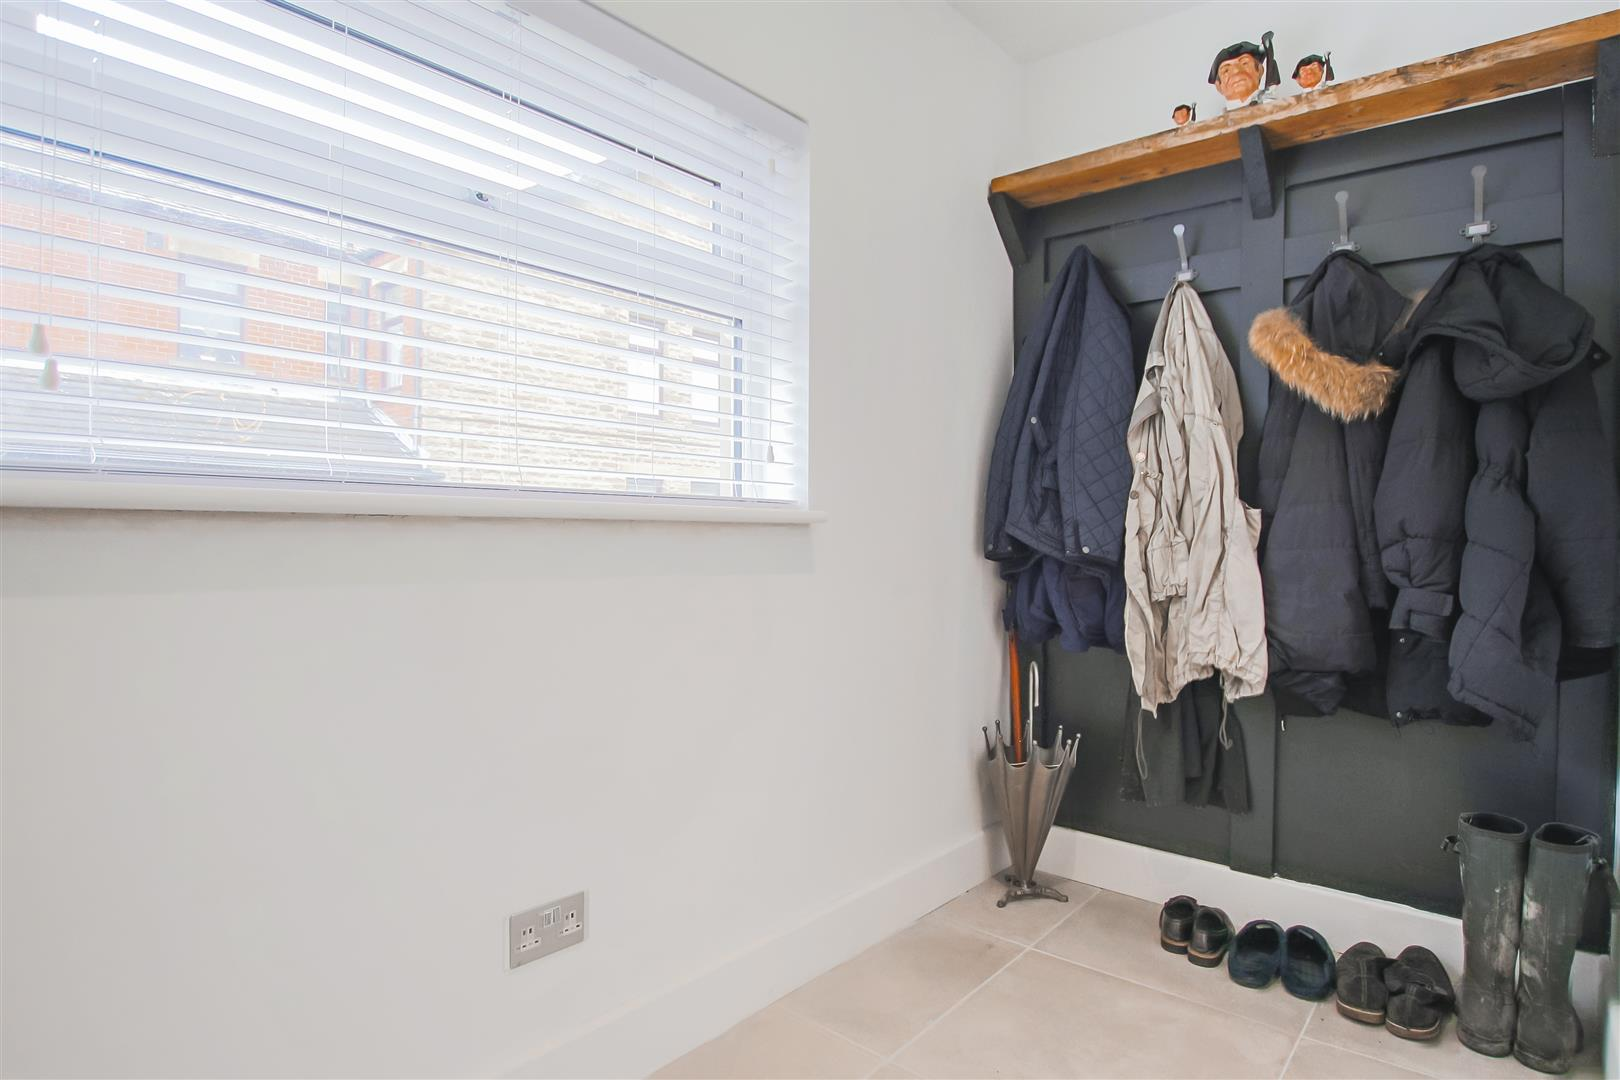 4 Bedroom Detached House For Sale - Image 51